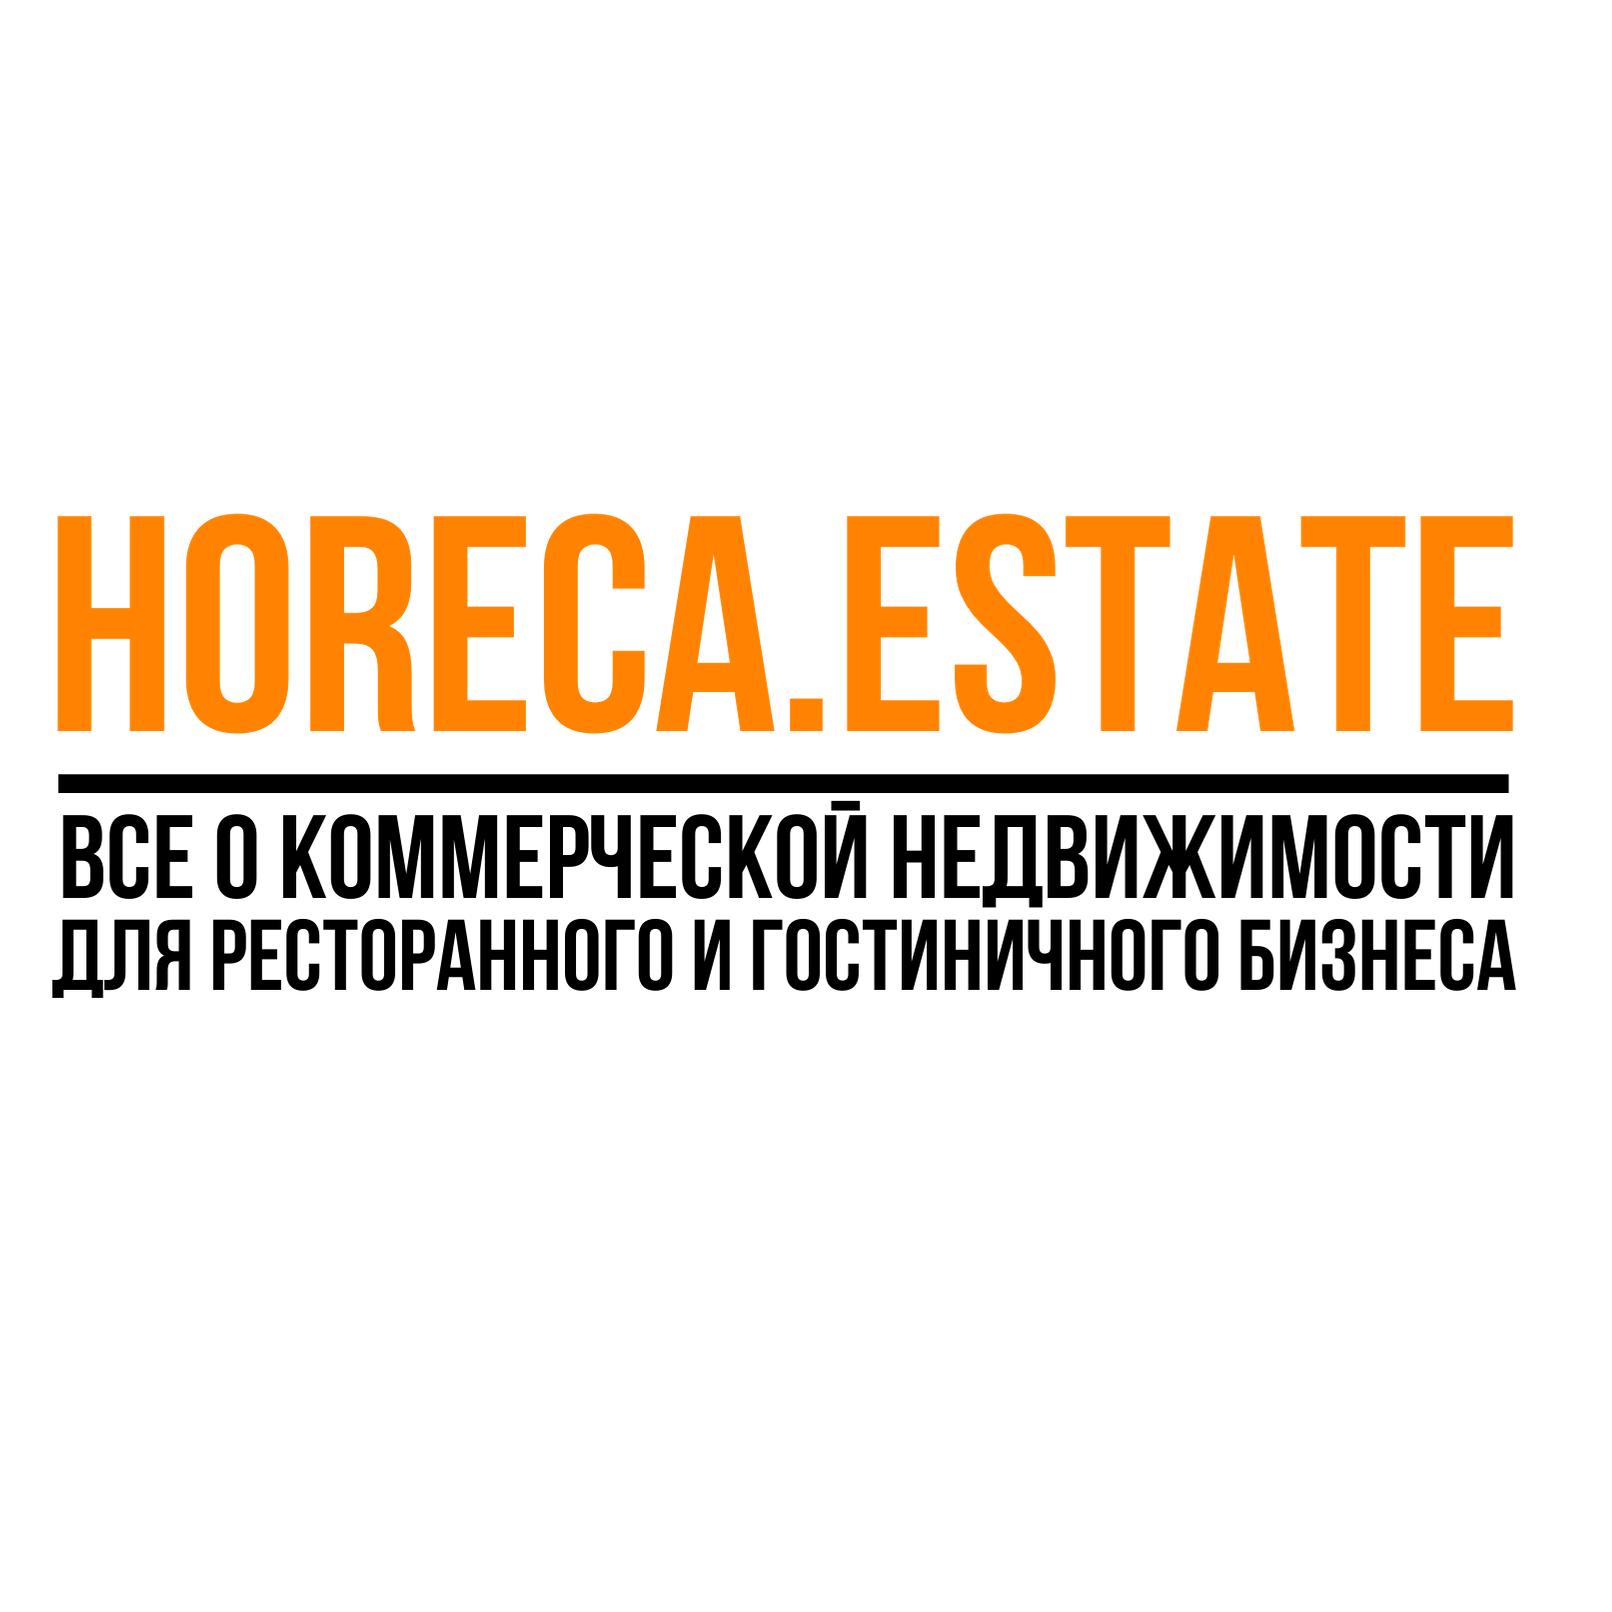 Horeca Estate